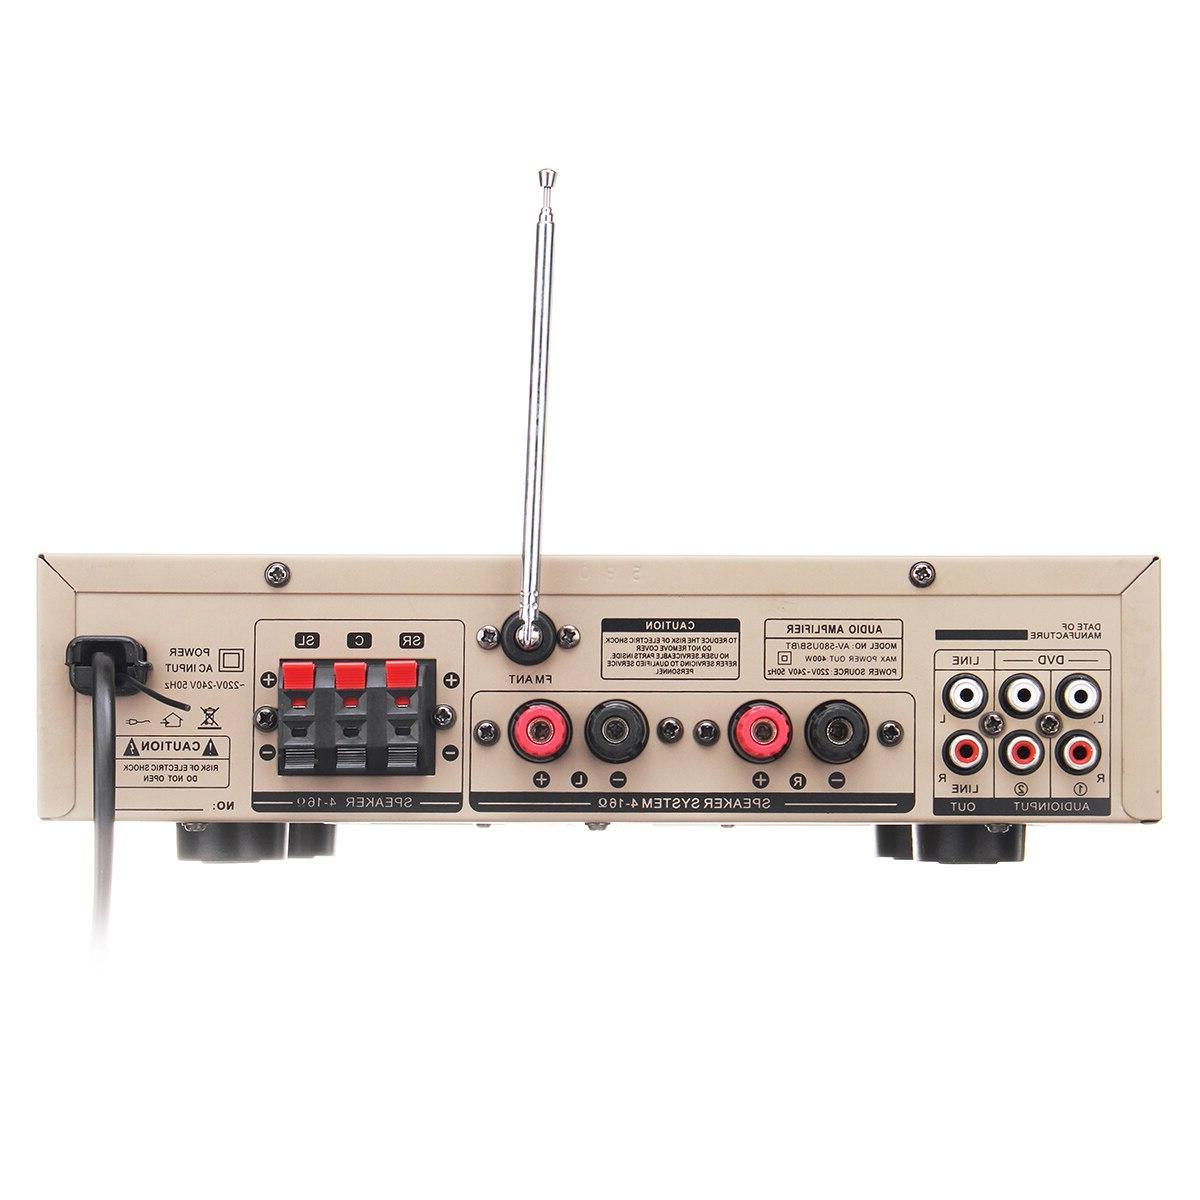 920W 5CH HiFi <font><b>Amplifier</b></font> Karaoke <font><b>Home</b></font> <font><b>Home</b></font> Theater <font><b>Amplifiers</b></font>